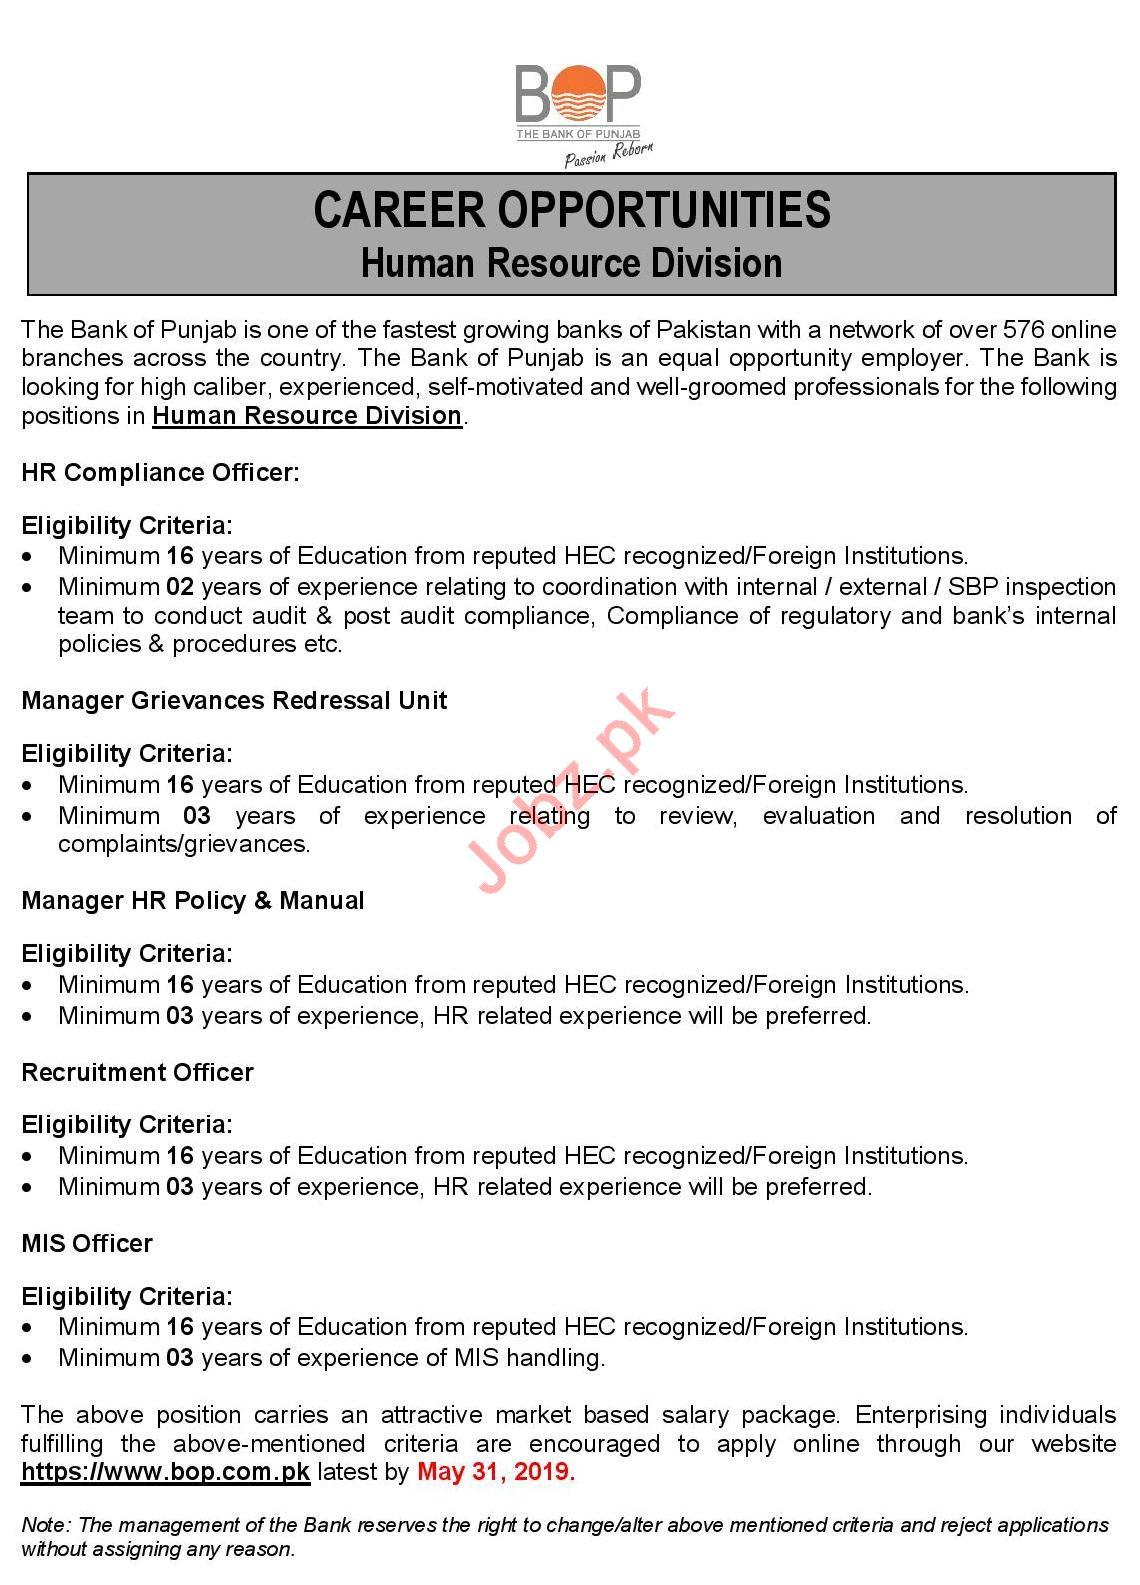 Human Resource Division Bank of Punjab BOP Jobs 2019